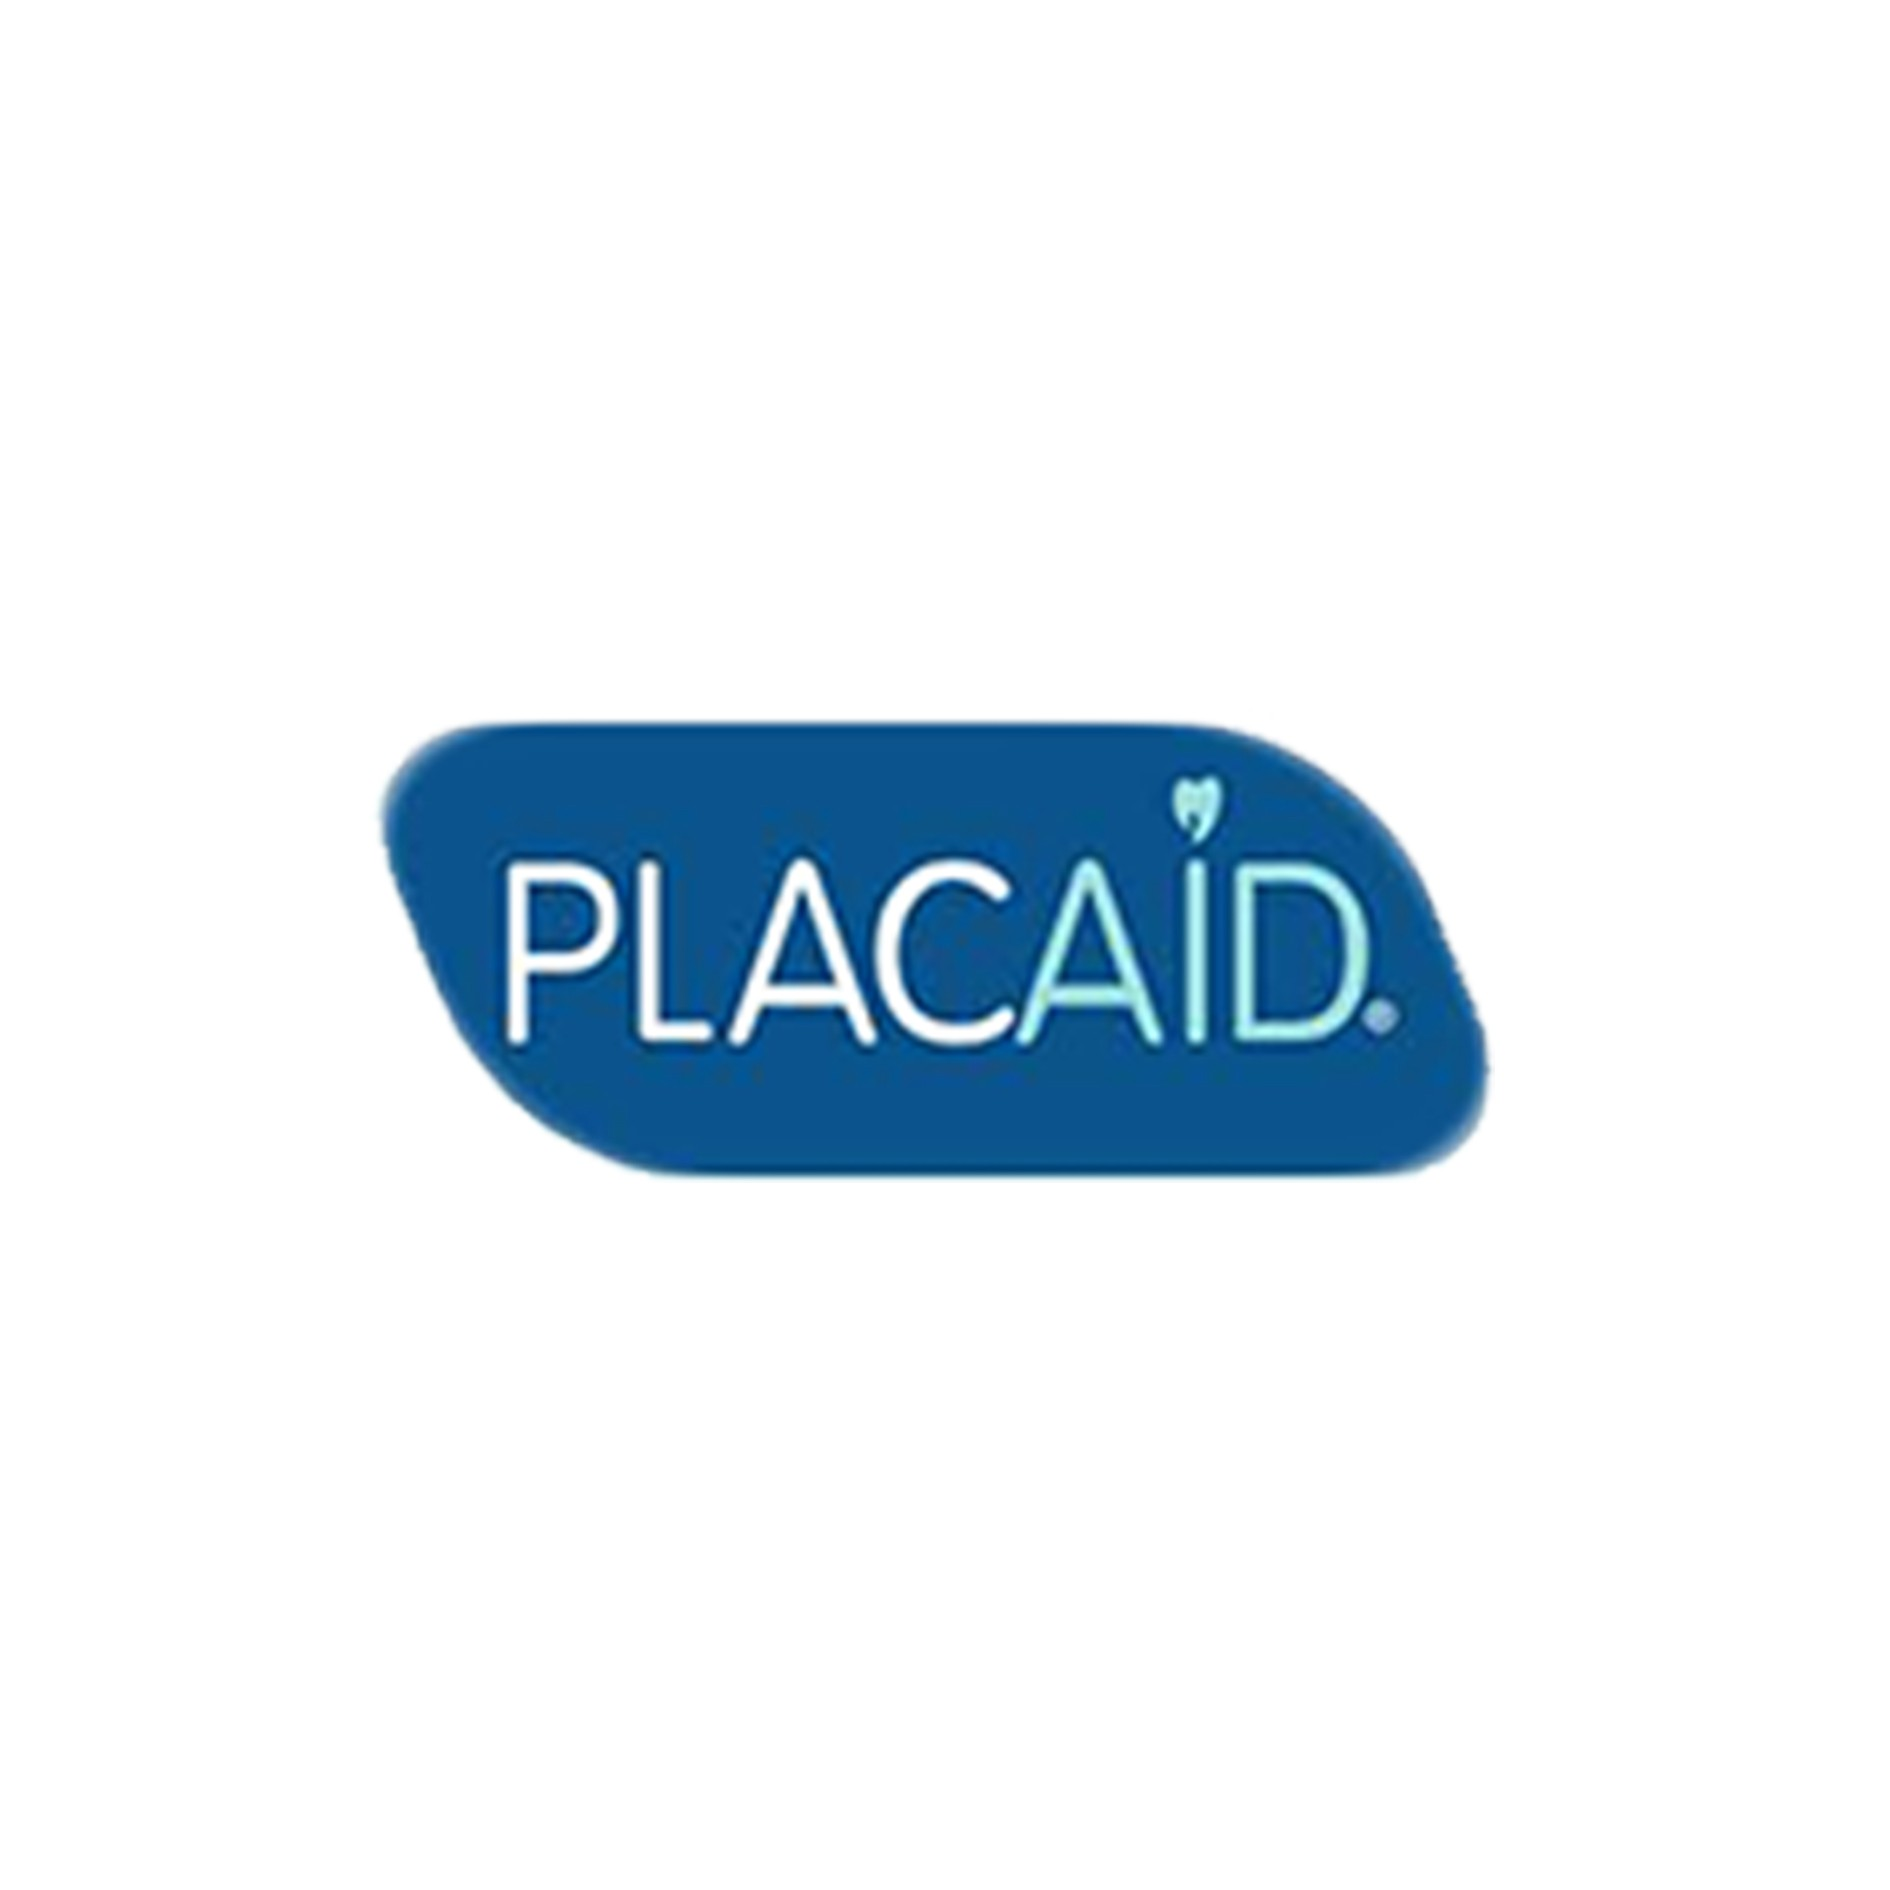 PlacAid